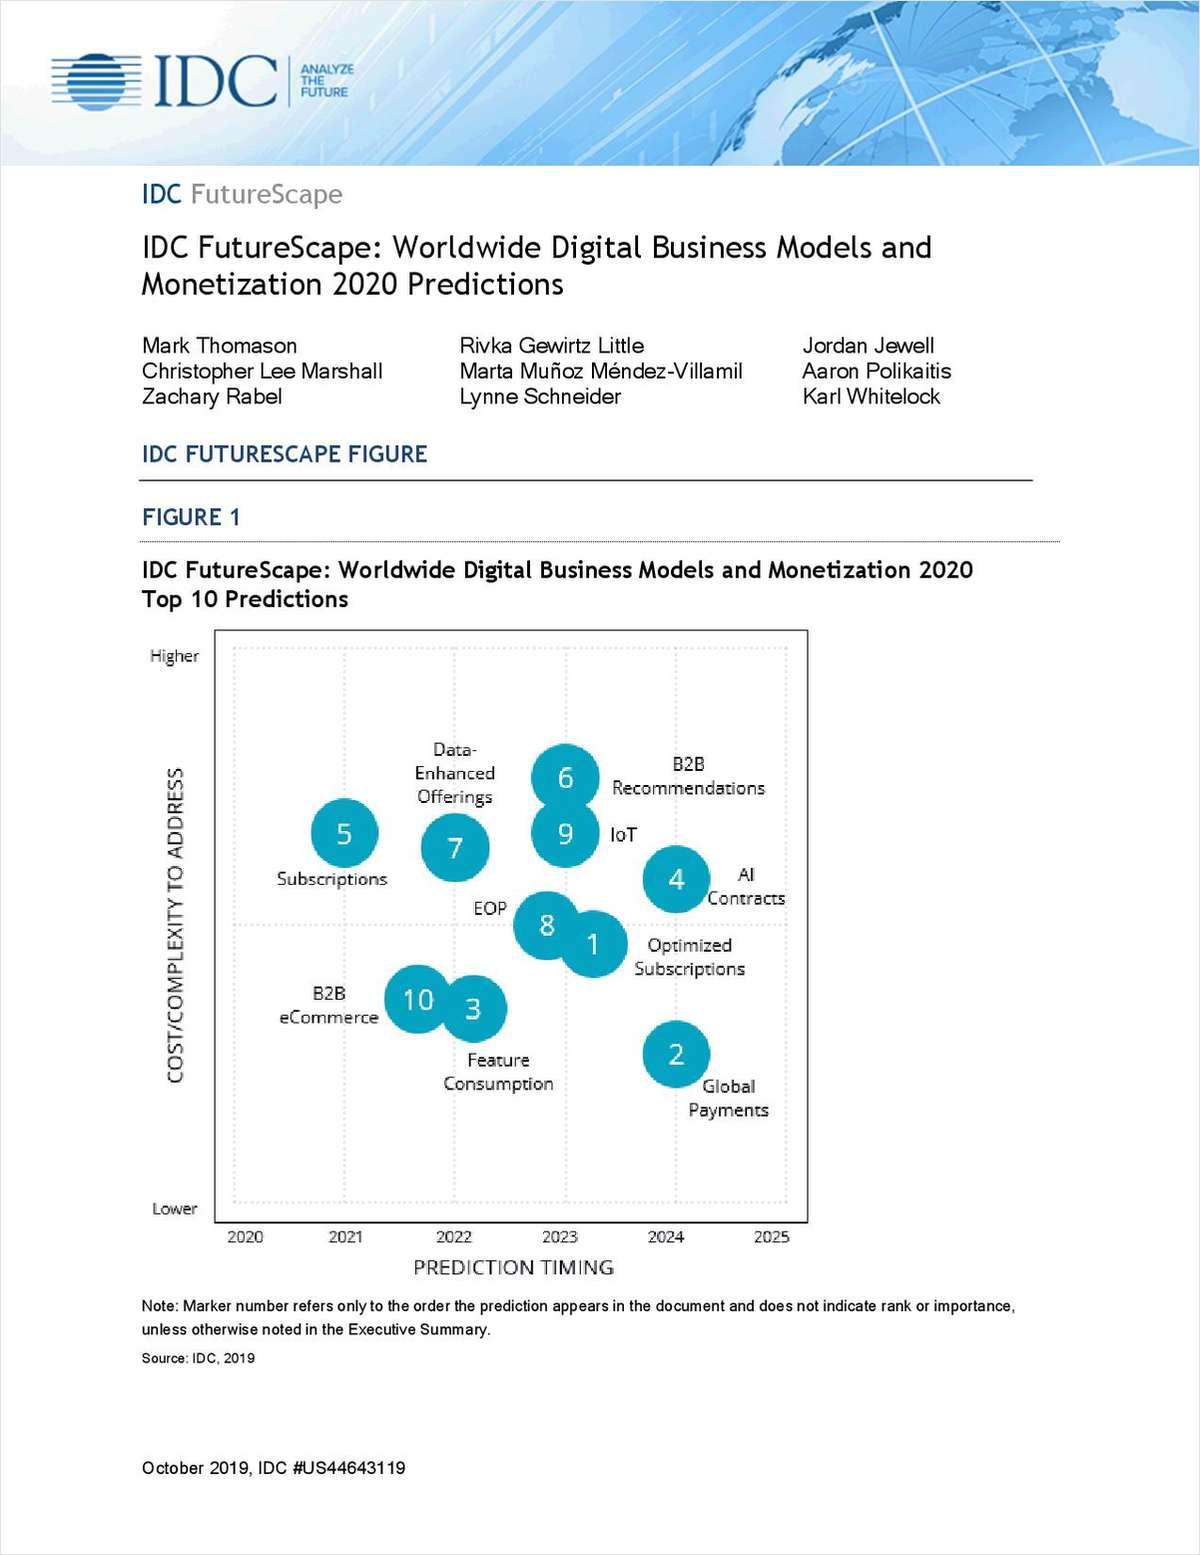 Worldwide Digital Business Models and Monetization 2020 Predictions